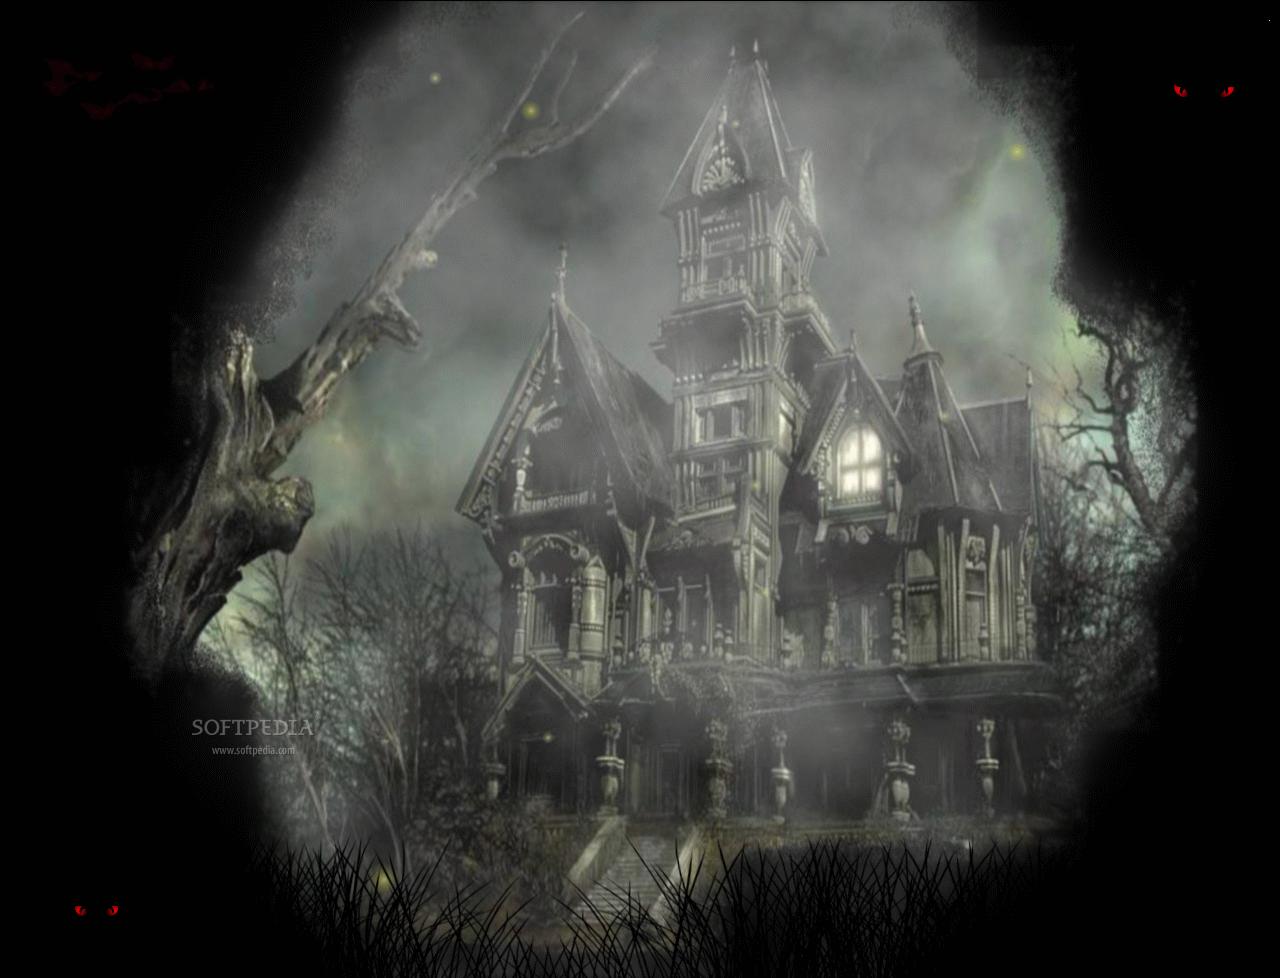 Halloween Mansion Animated Wallpaper   Halloween Mansion Animated 1280x978